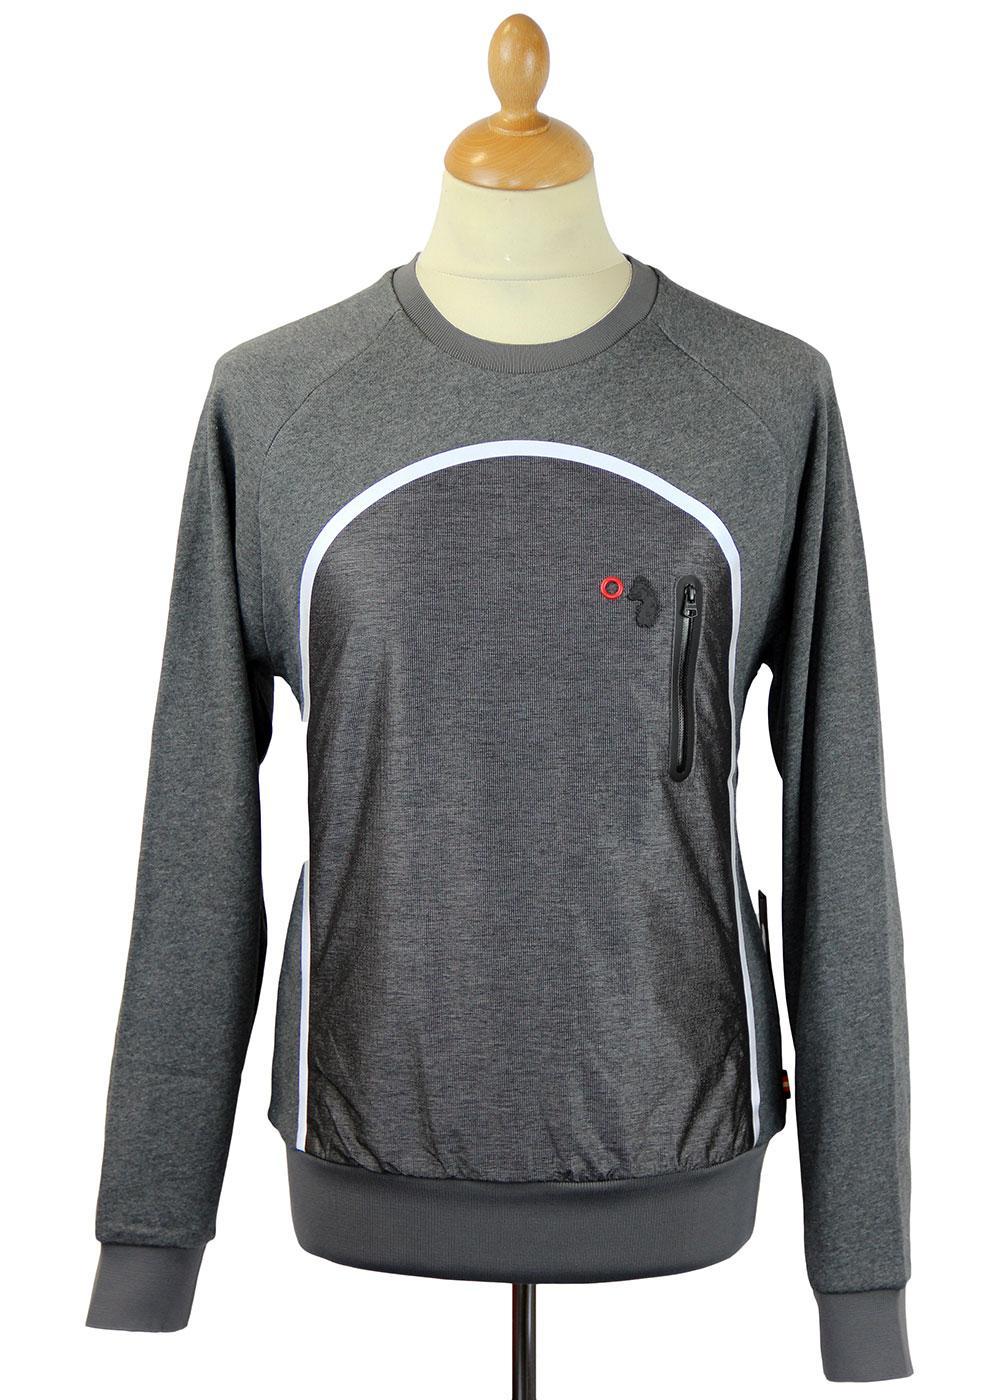 Cappy LUKE 1977 Retro Indie Technical Sweatshirt G